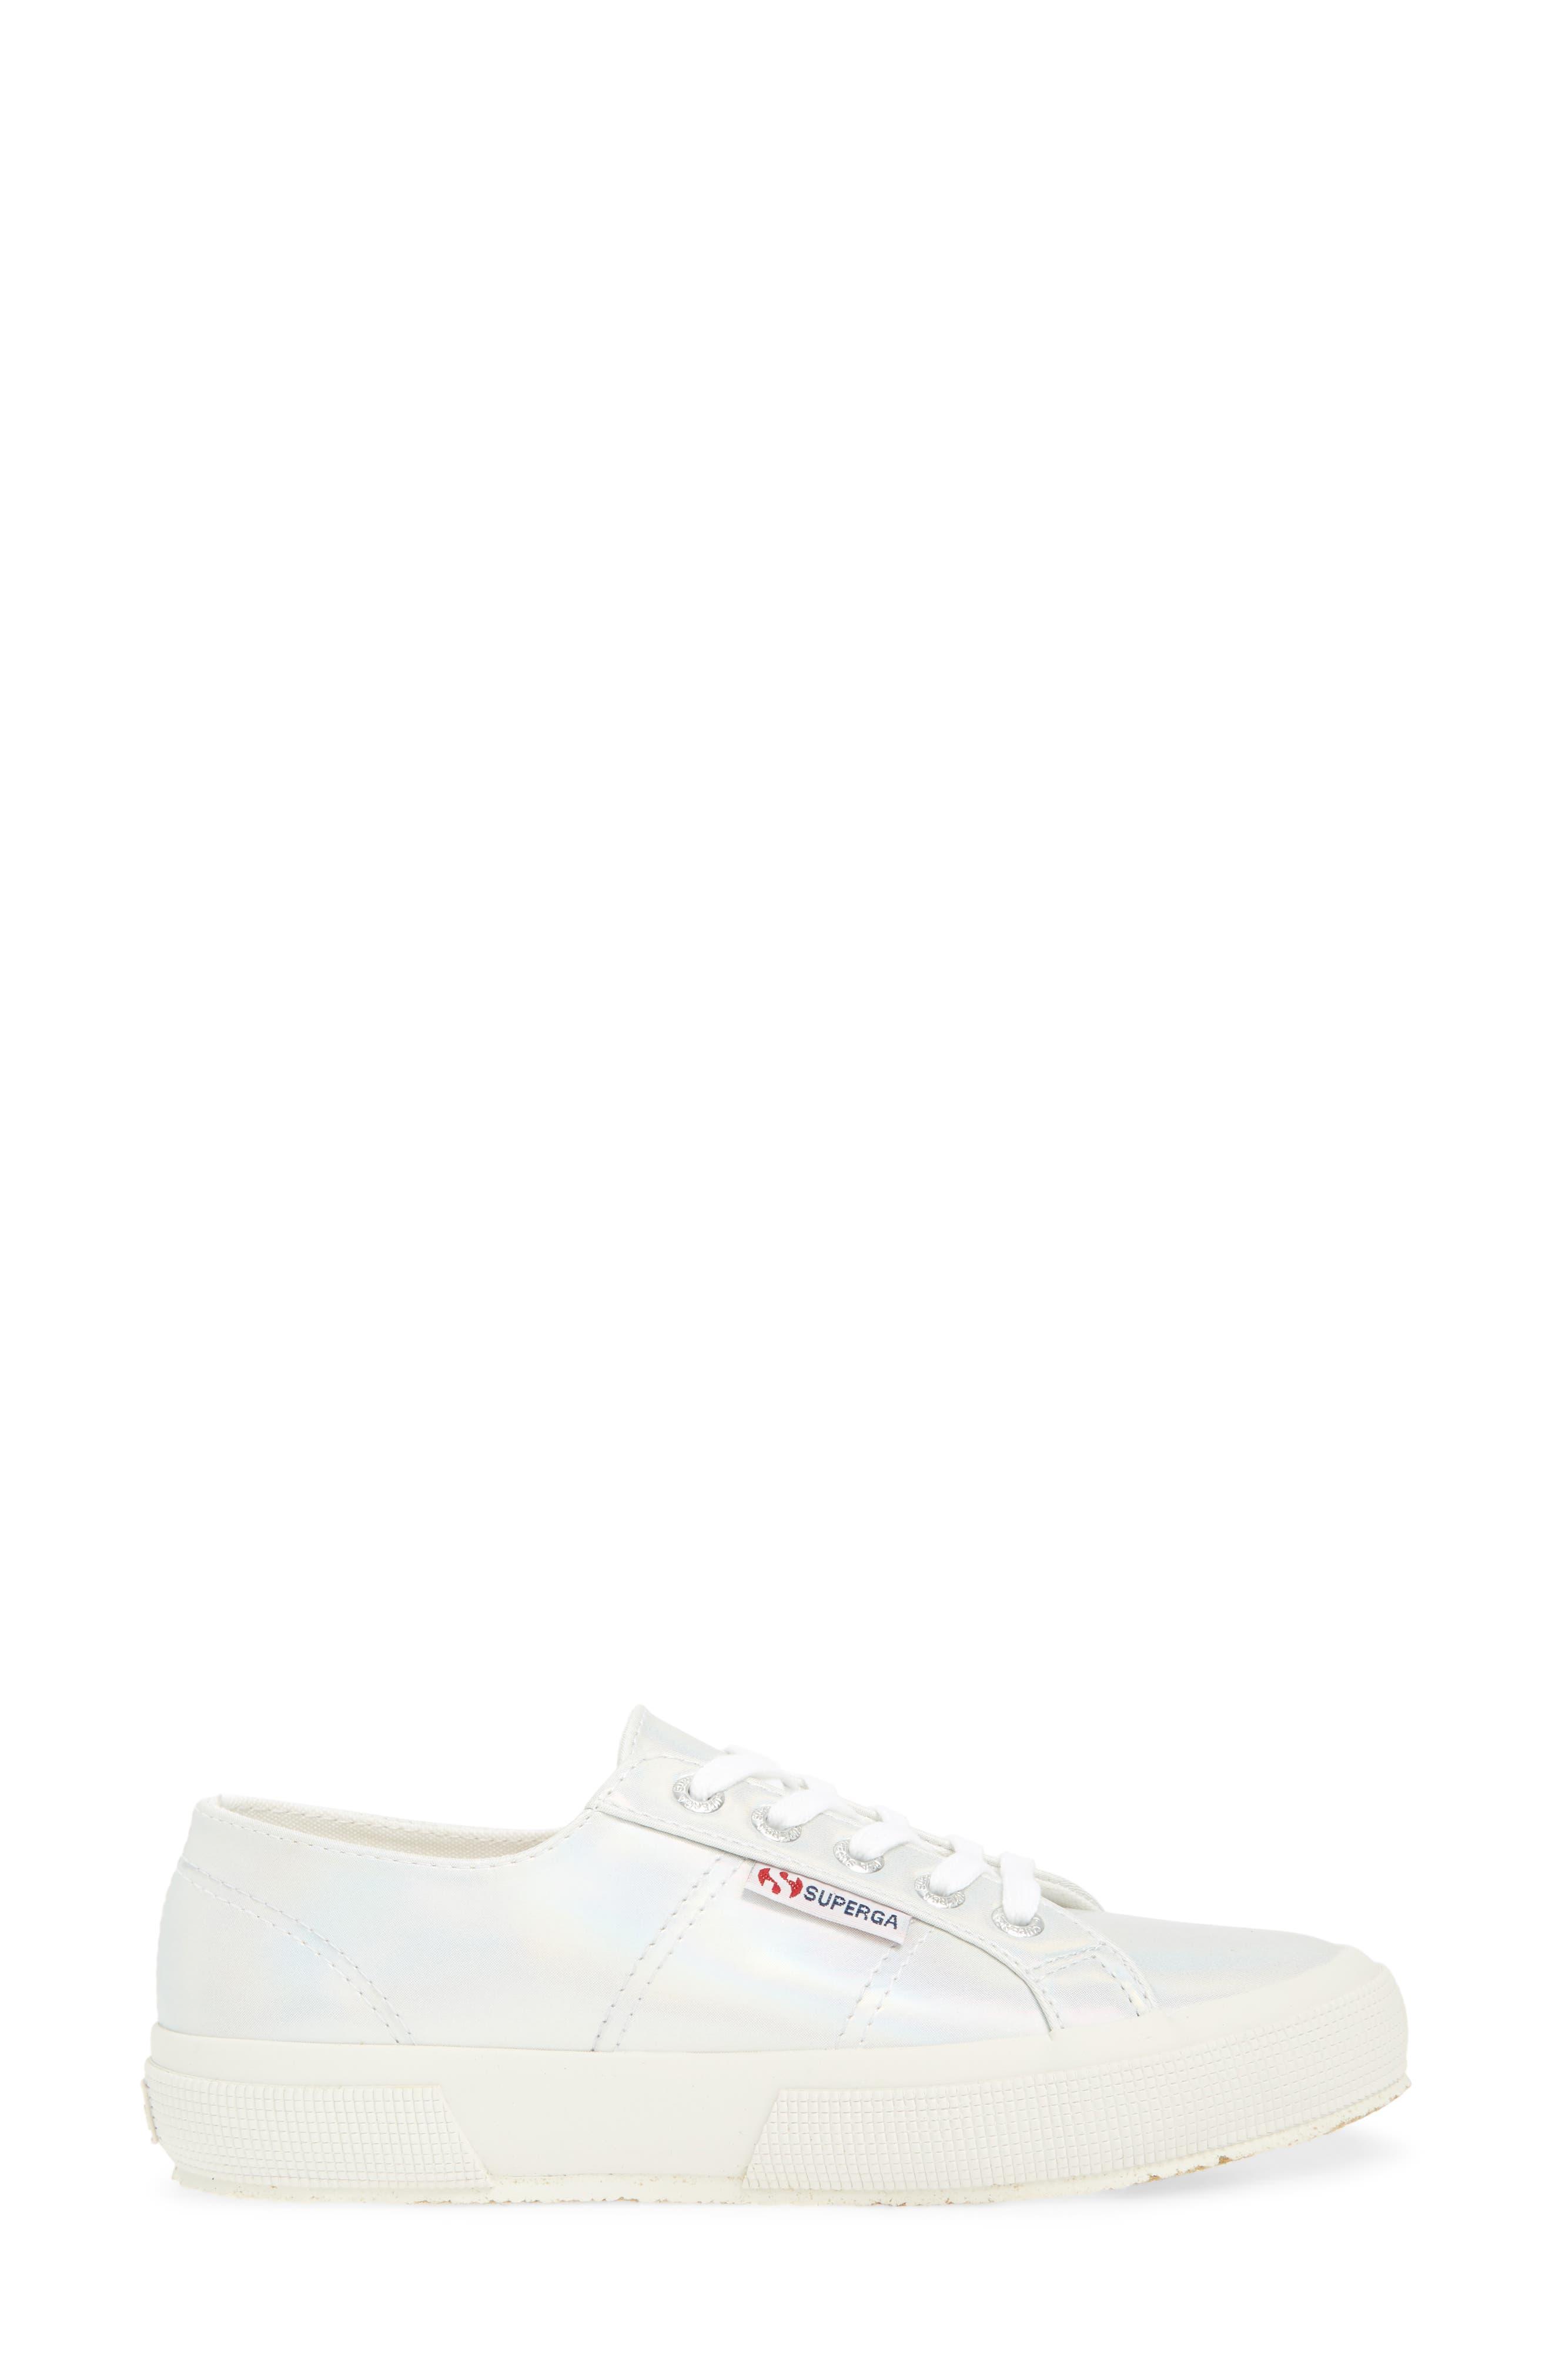 2750 Hologramw Low Top Sneaker,                             Alternate thumbnail 3, color,                             040